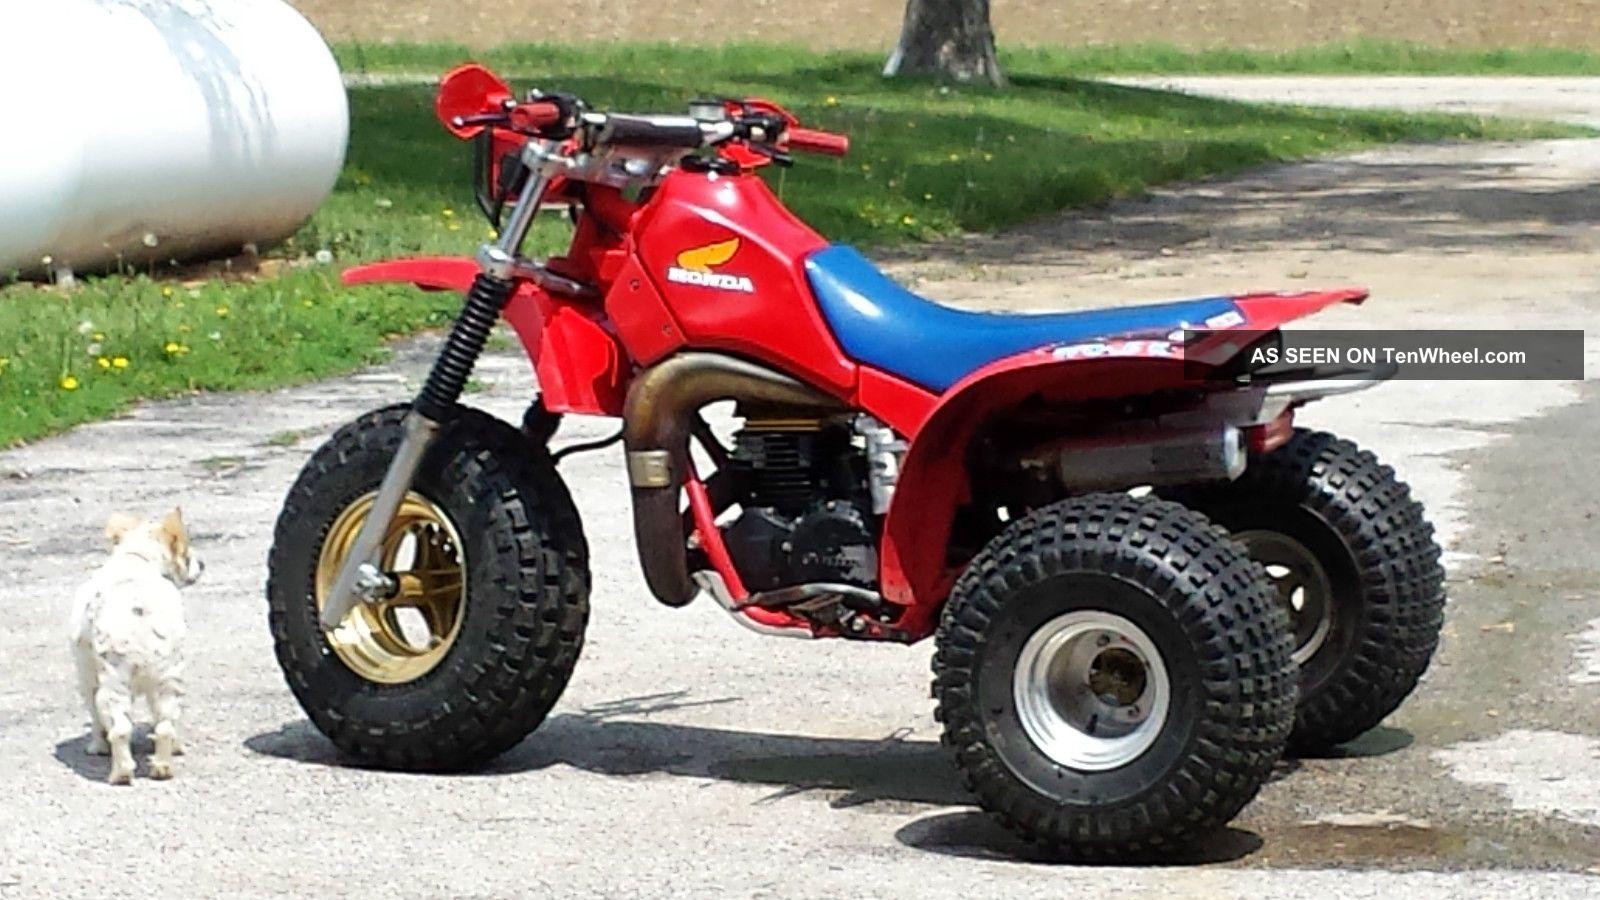 1984 Honda Atc Honda photo